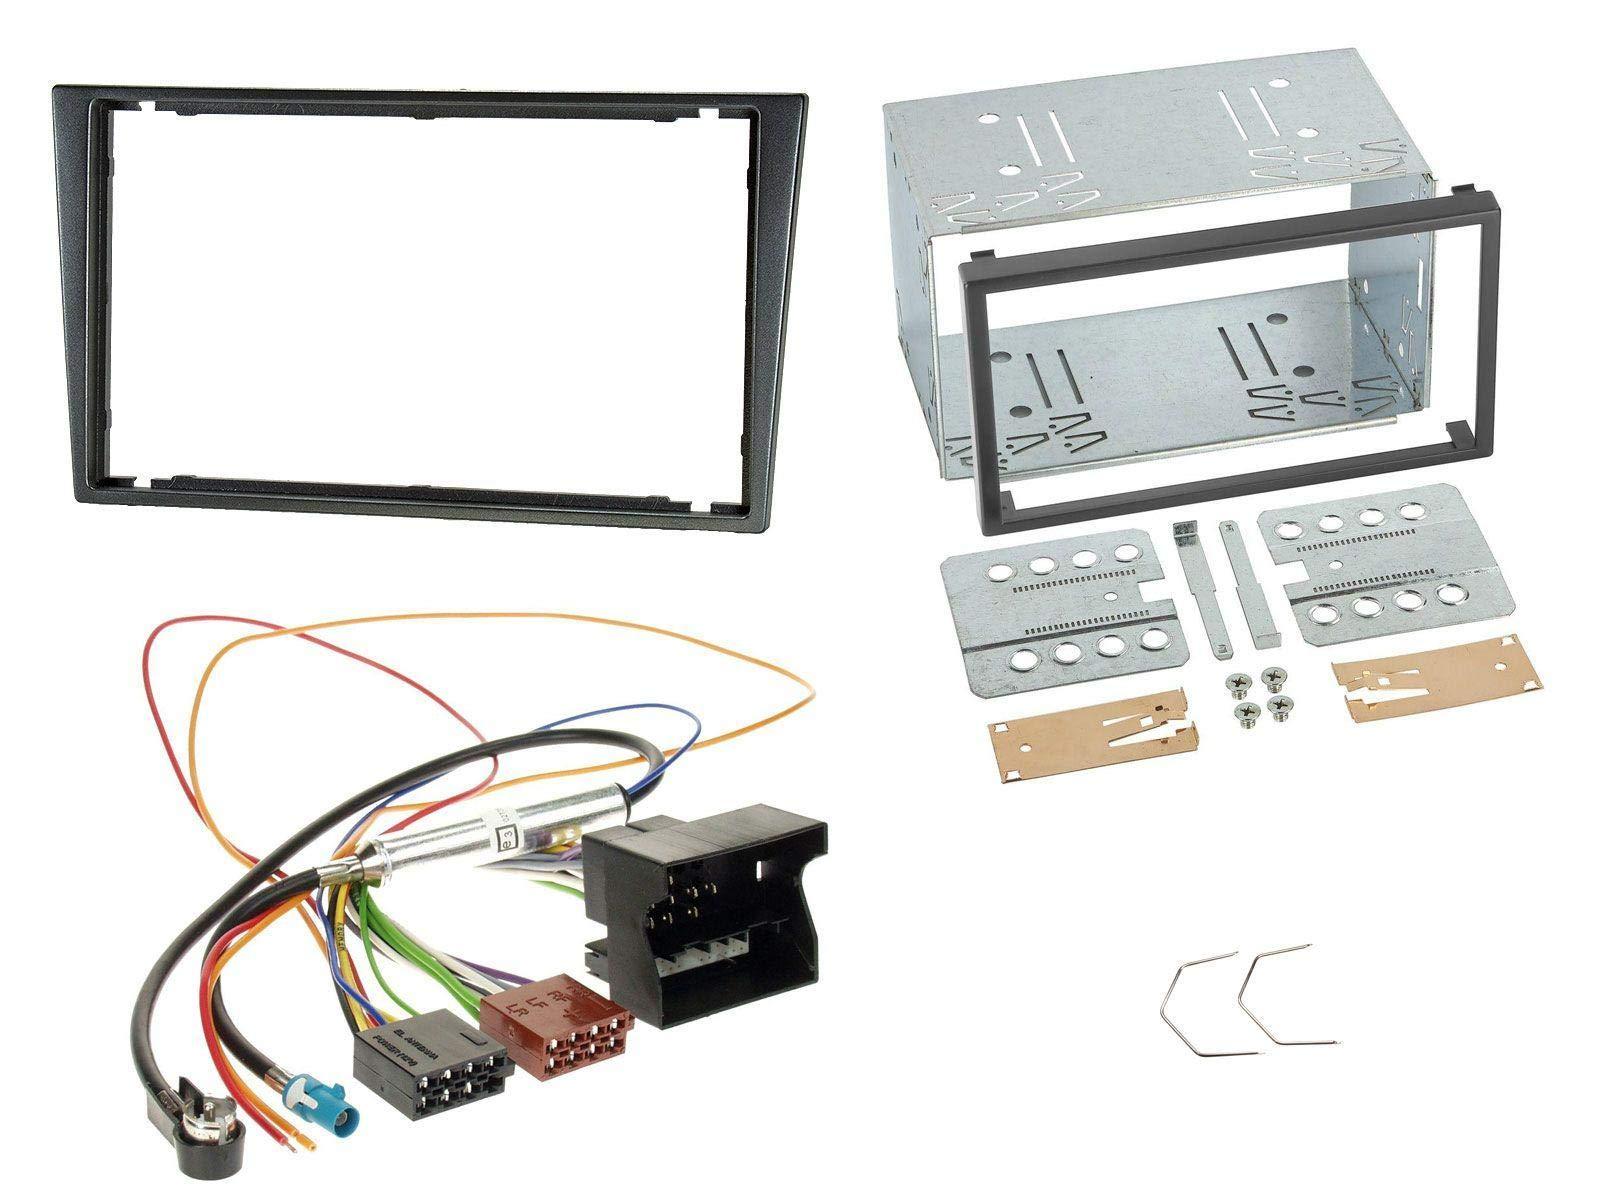 caraudio24-Kenwood-DMX120BT-AUX-Bluetooth-USB-MP3-2DIN-Autoradio-fr-Opel-Combo-C-Meriva-Corsa-C-Tigra-ab-2005-grau